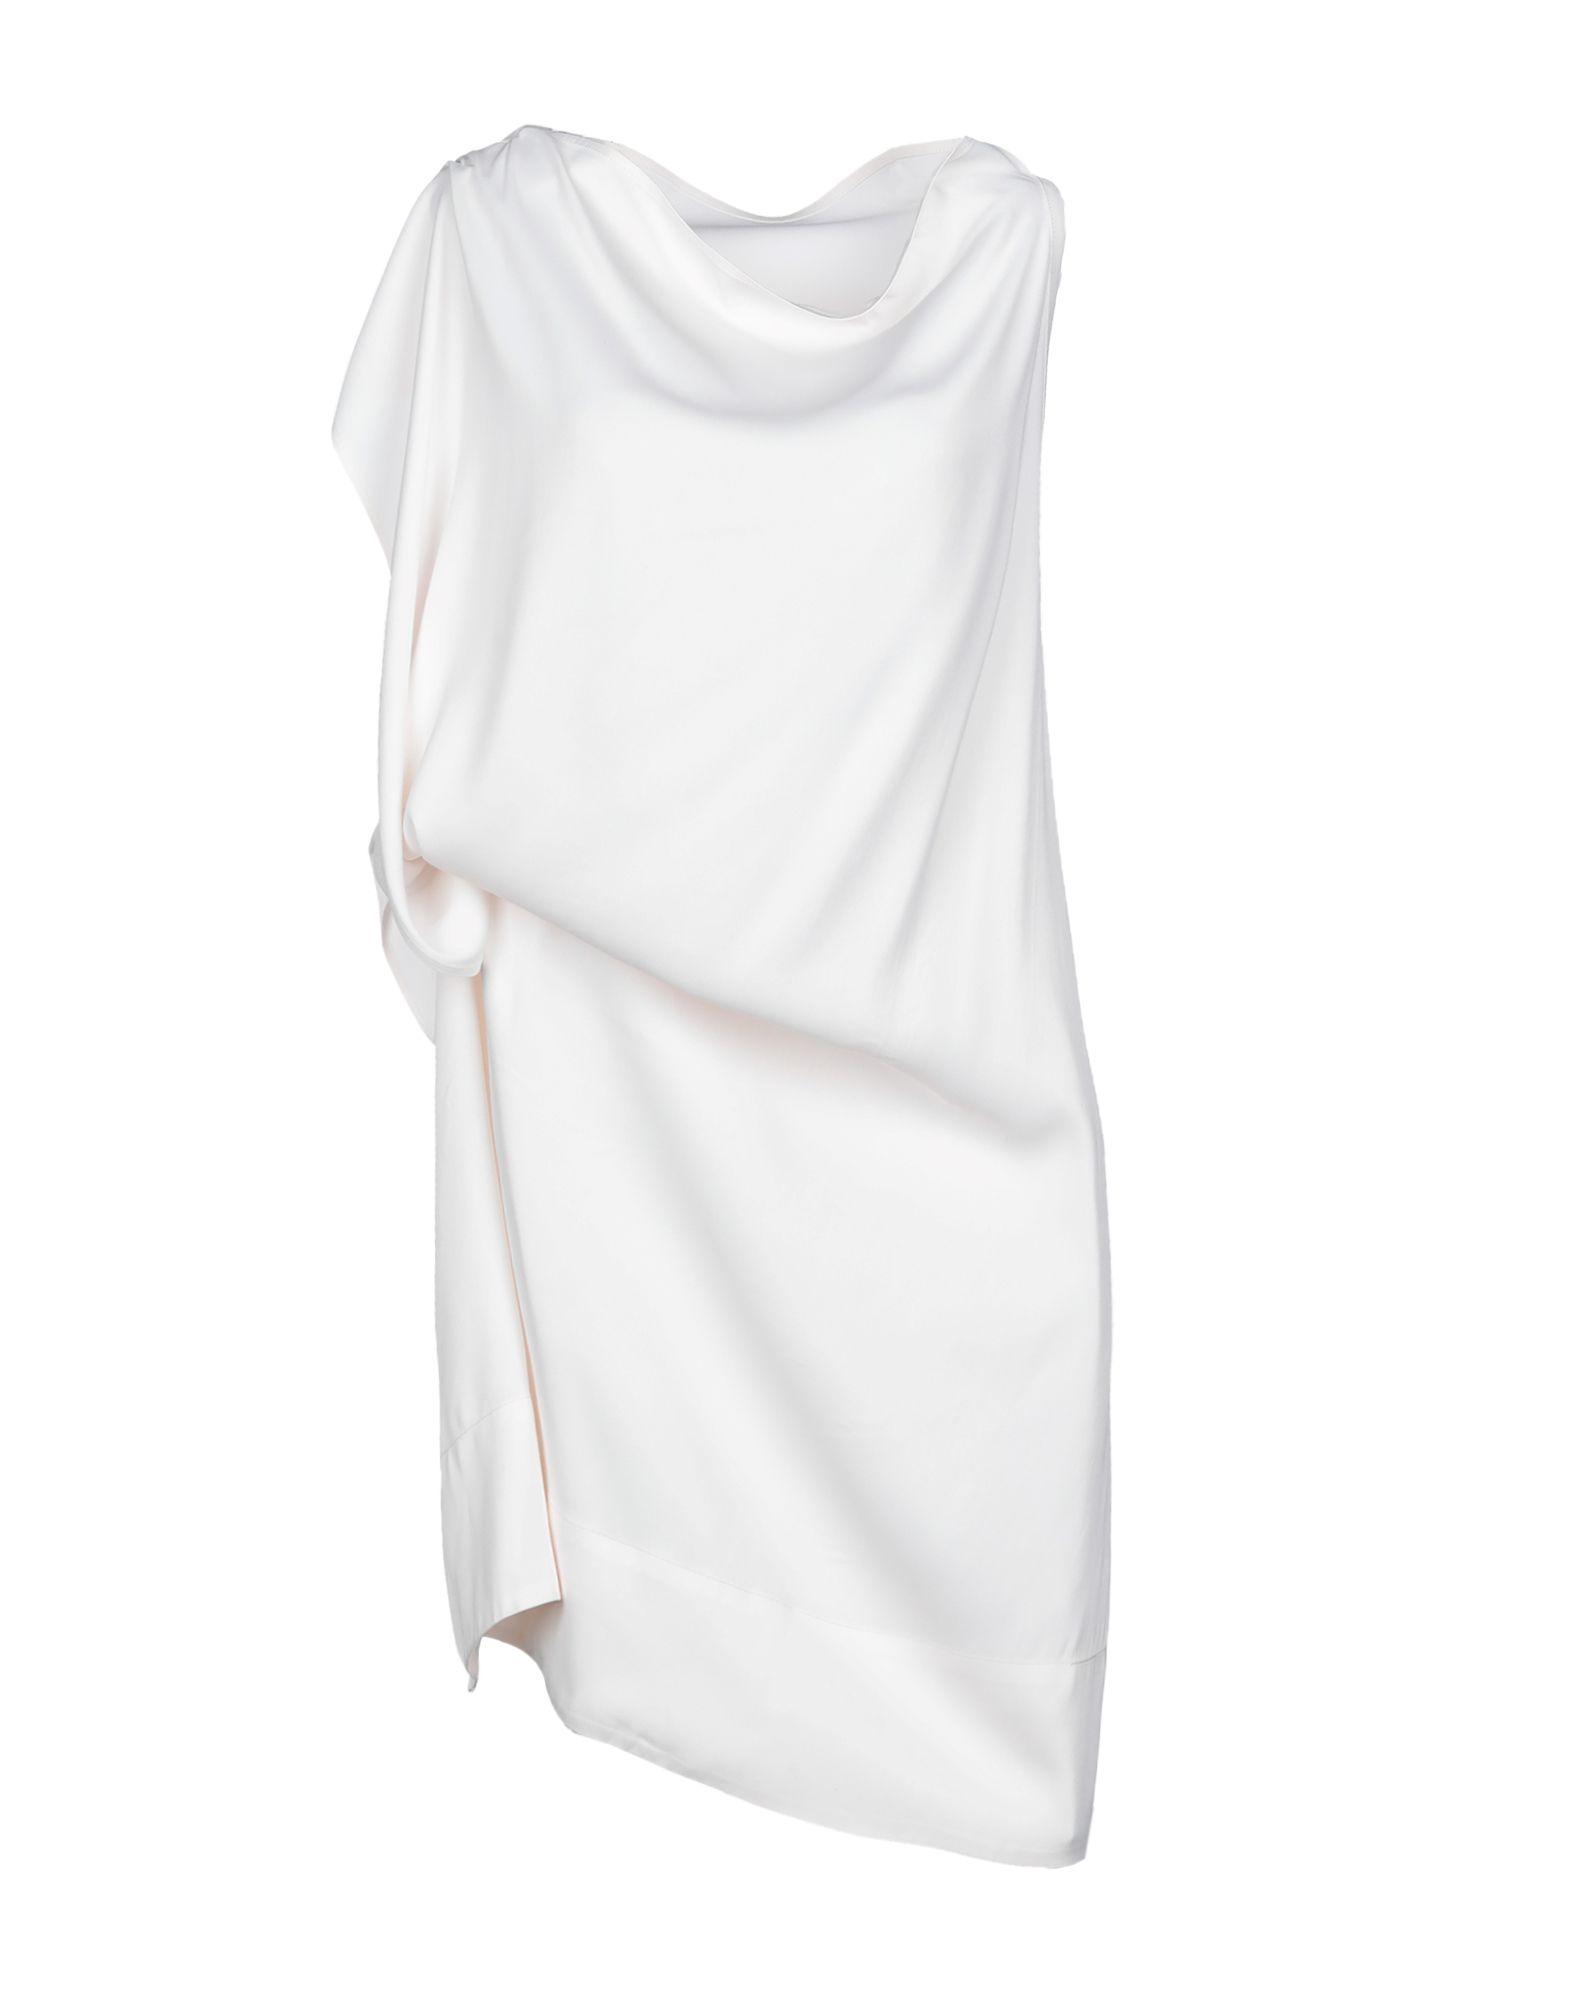 ANN DEMEULEMEESTER Короткое платье подгузники children le ann s44